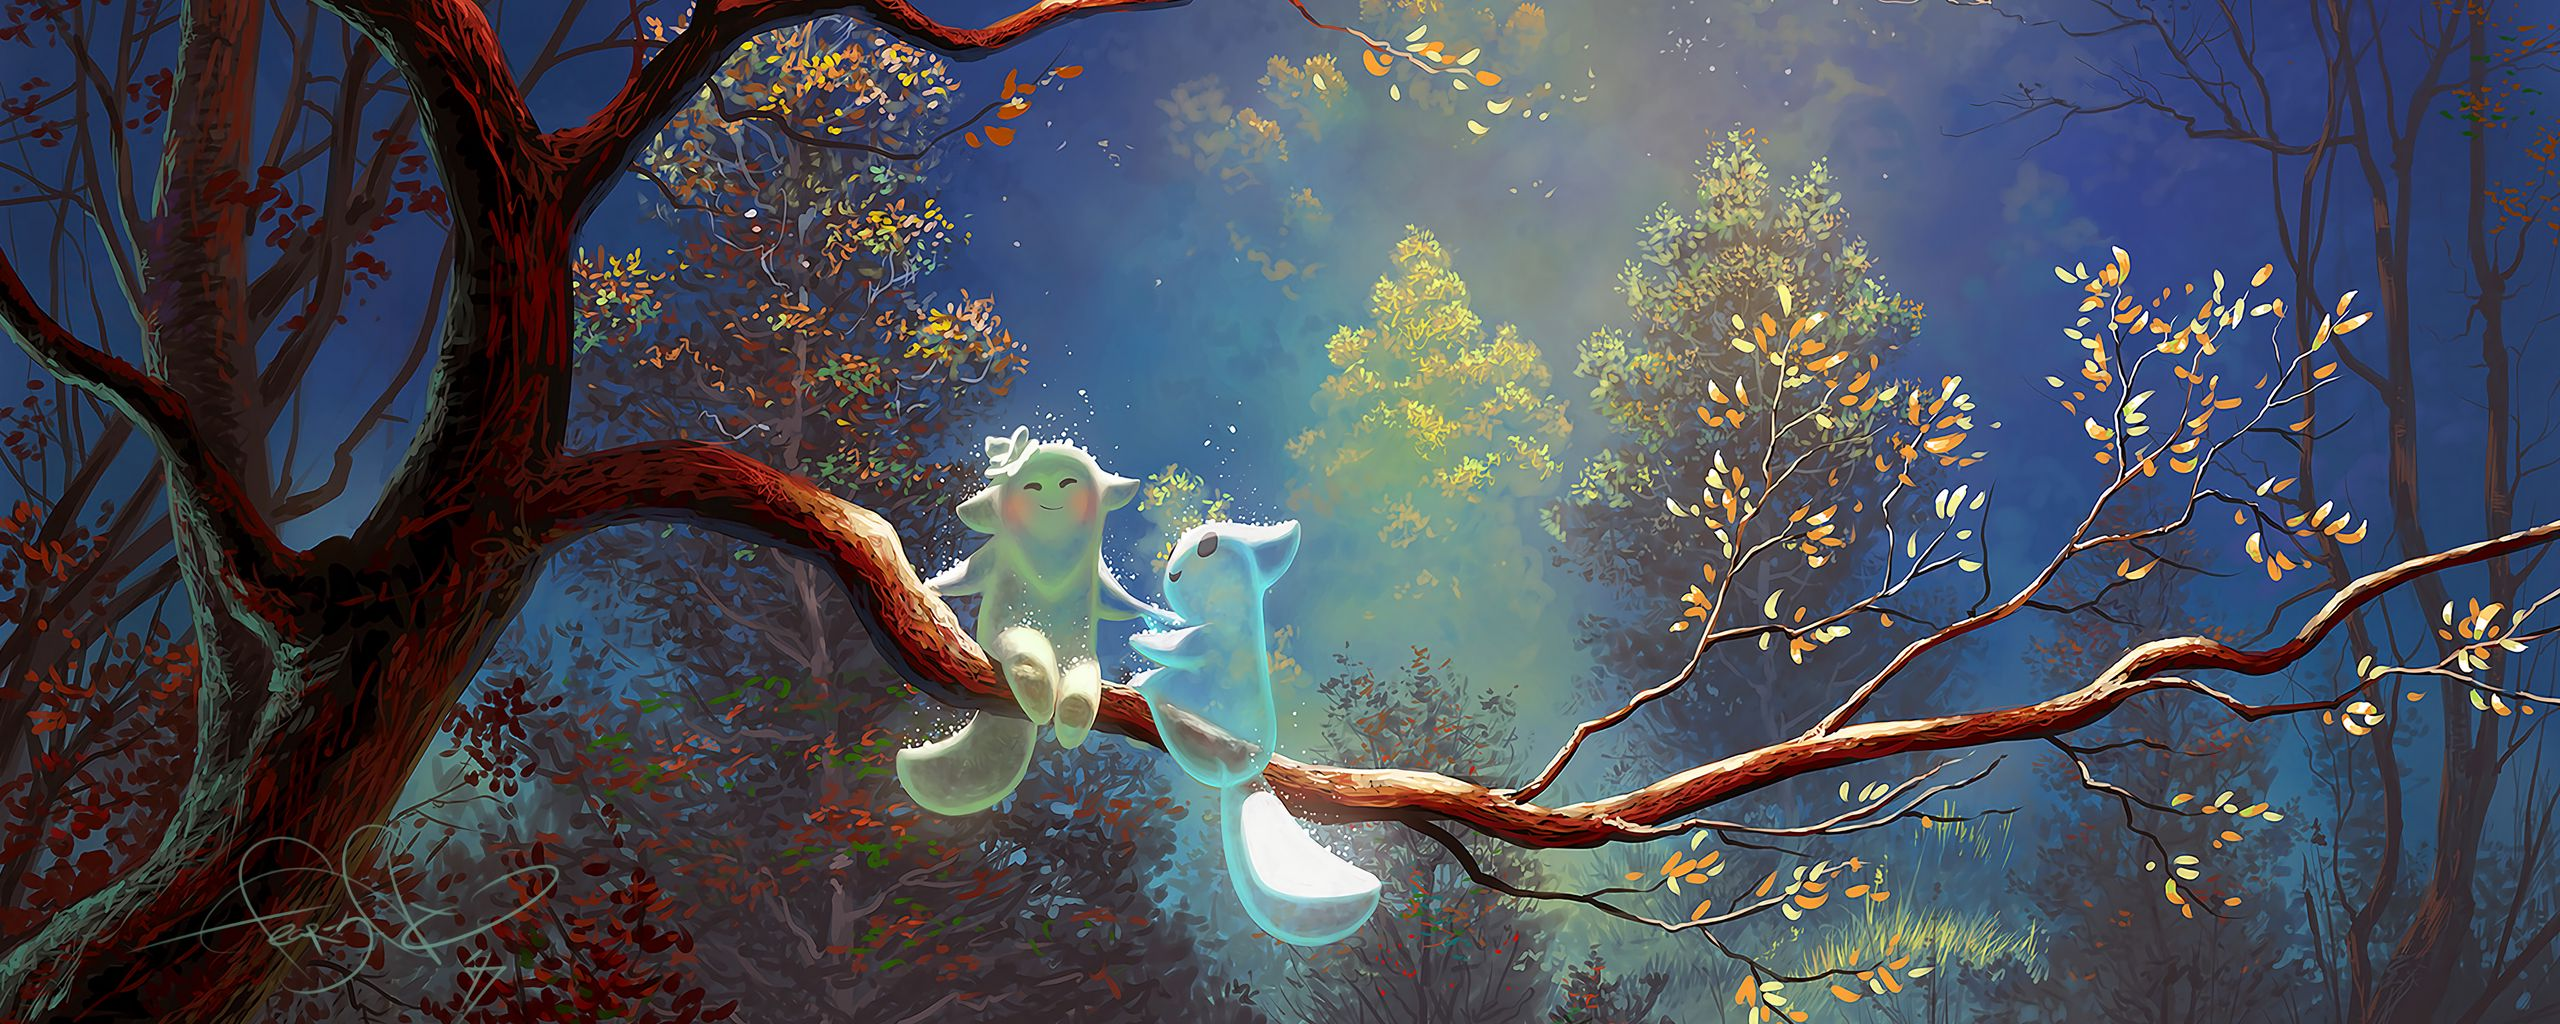 2560x1024 Wallpaper animals, tree, branch, magic, art, fantasy